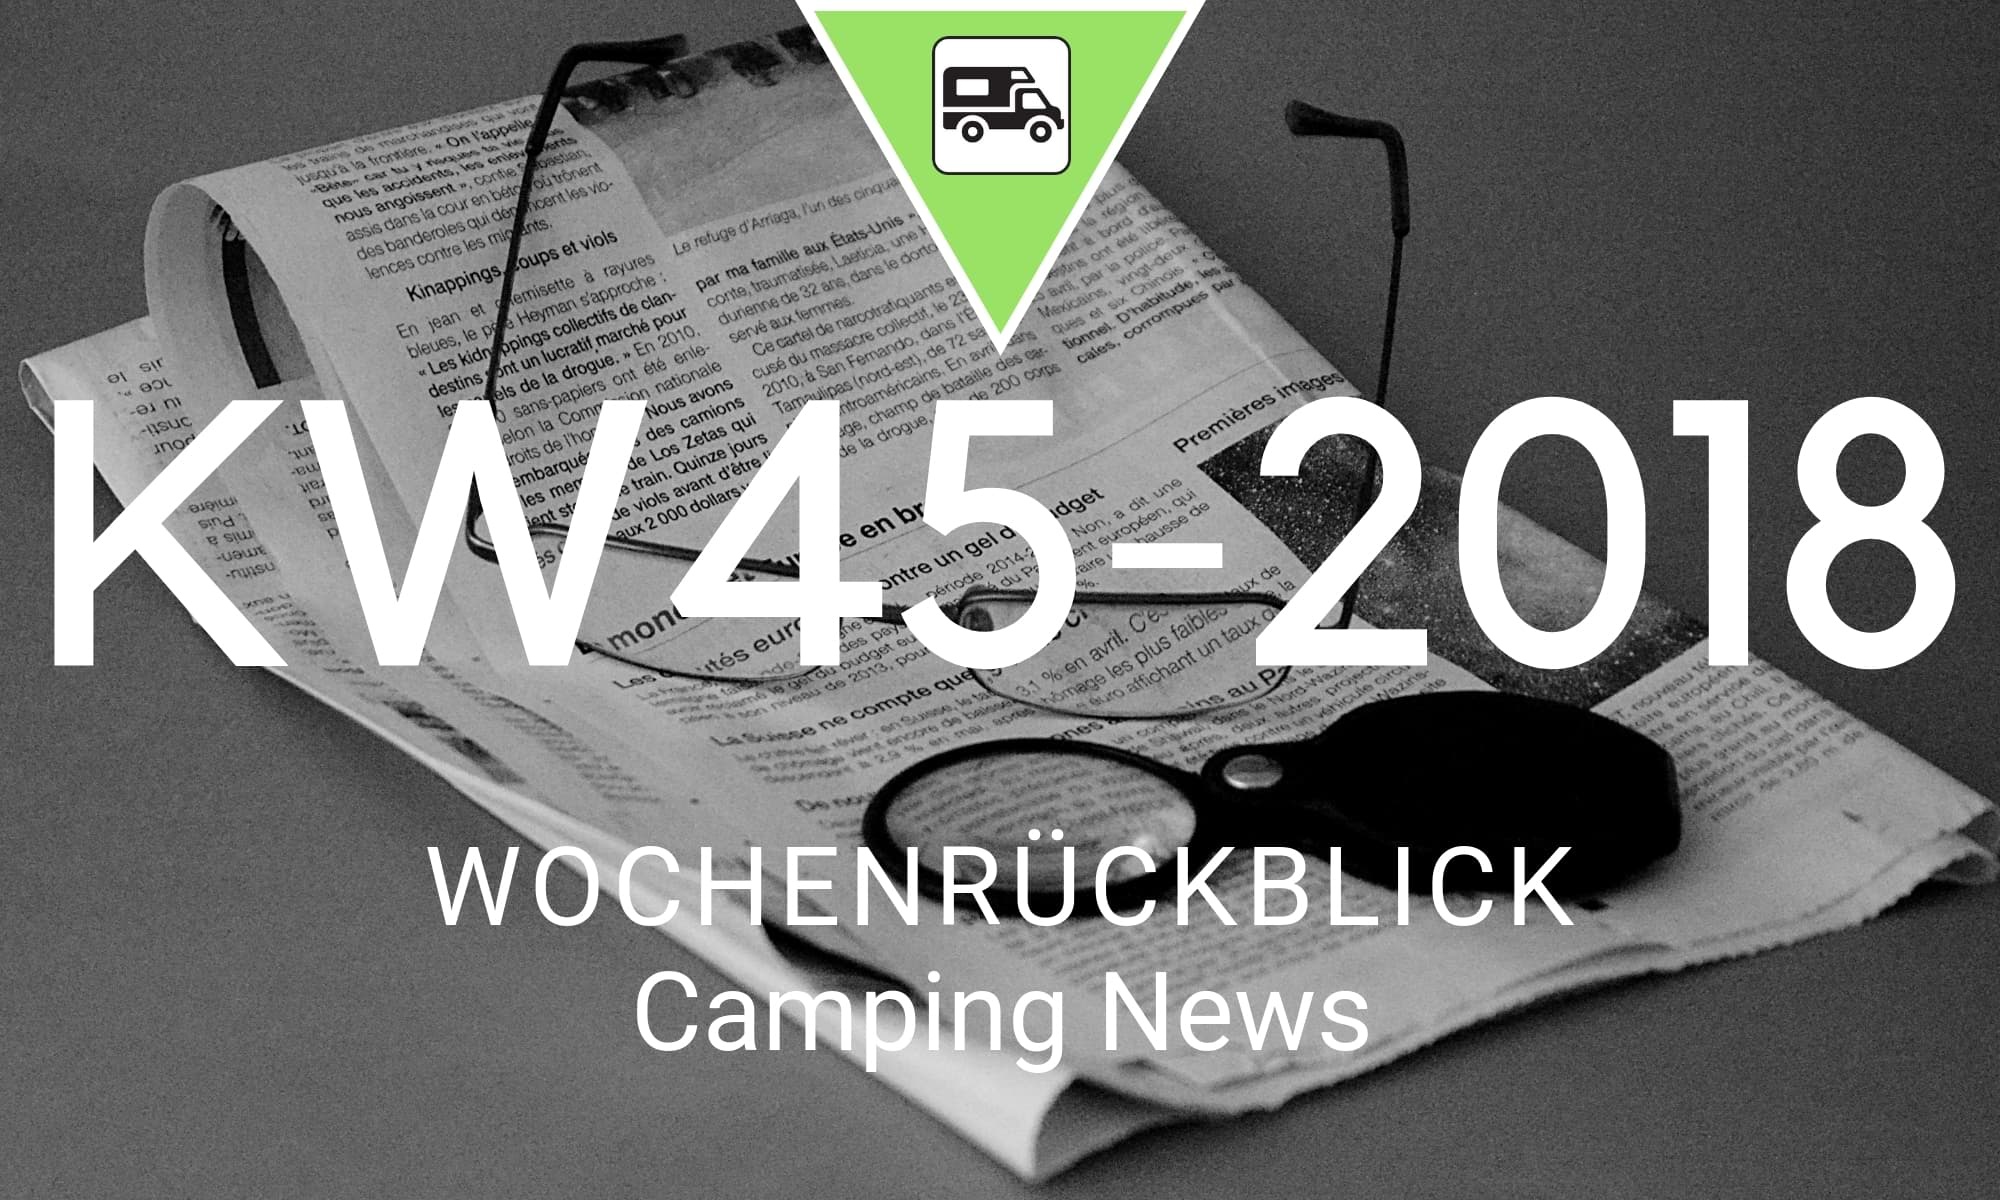 Wochenrückblick Camping News KW45-2018